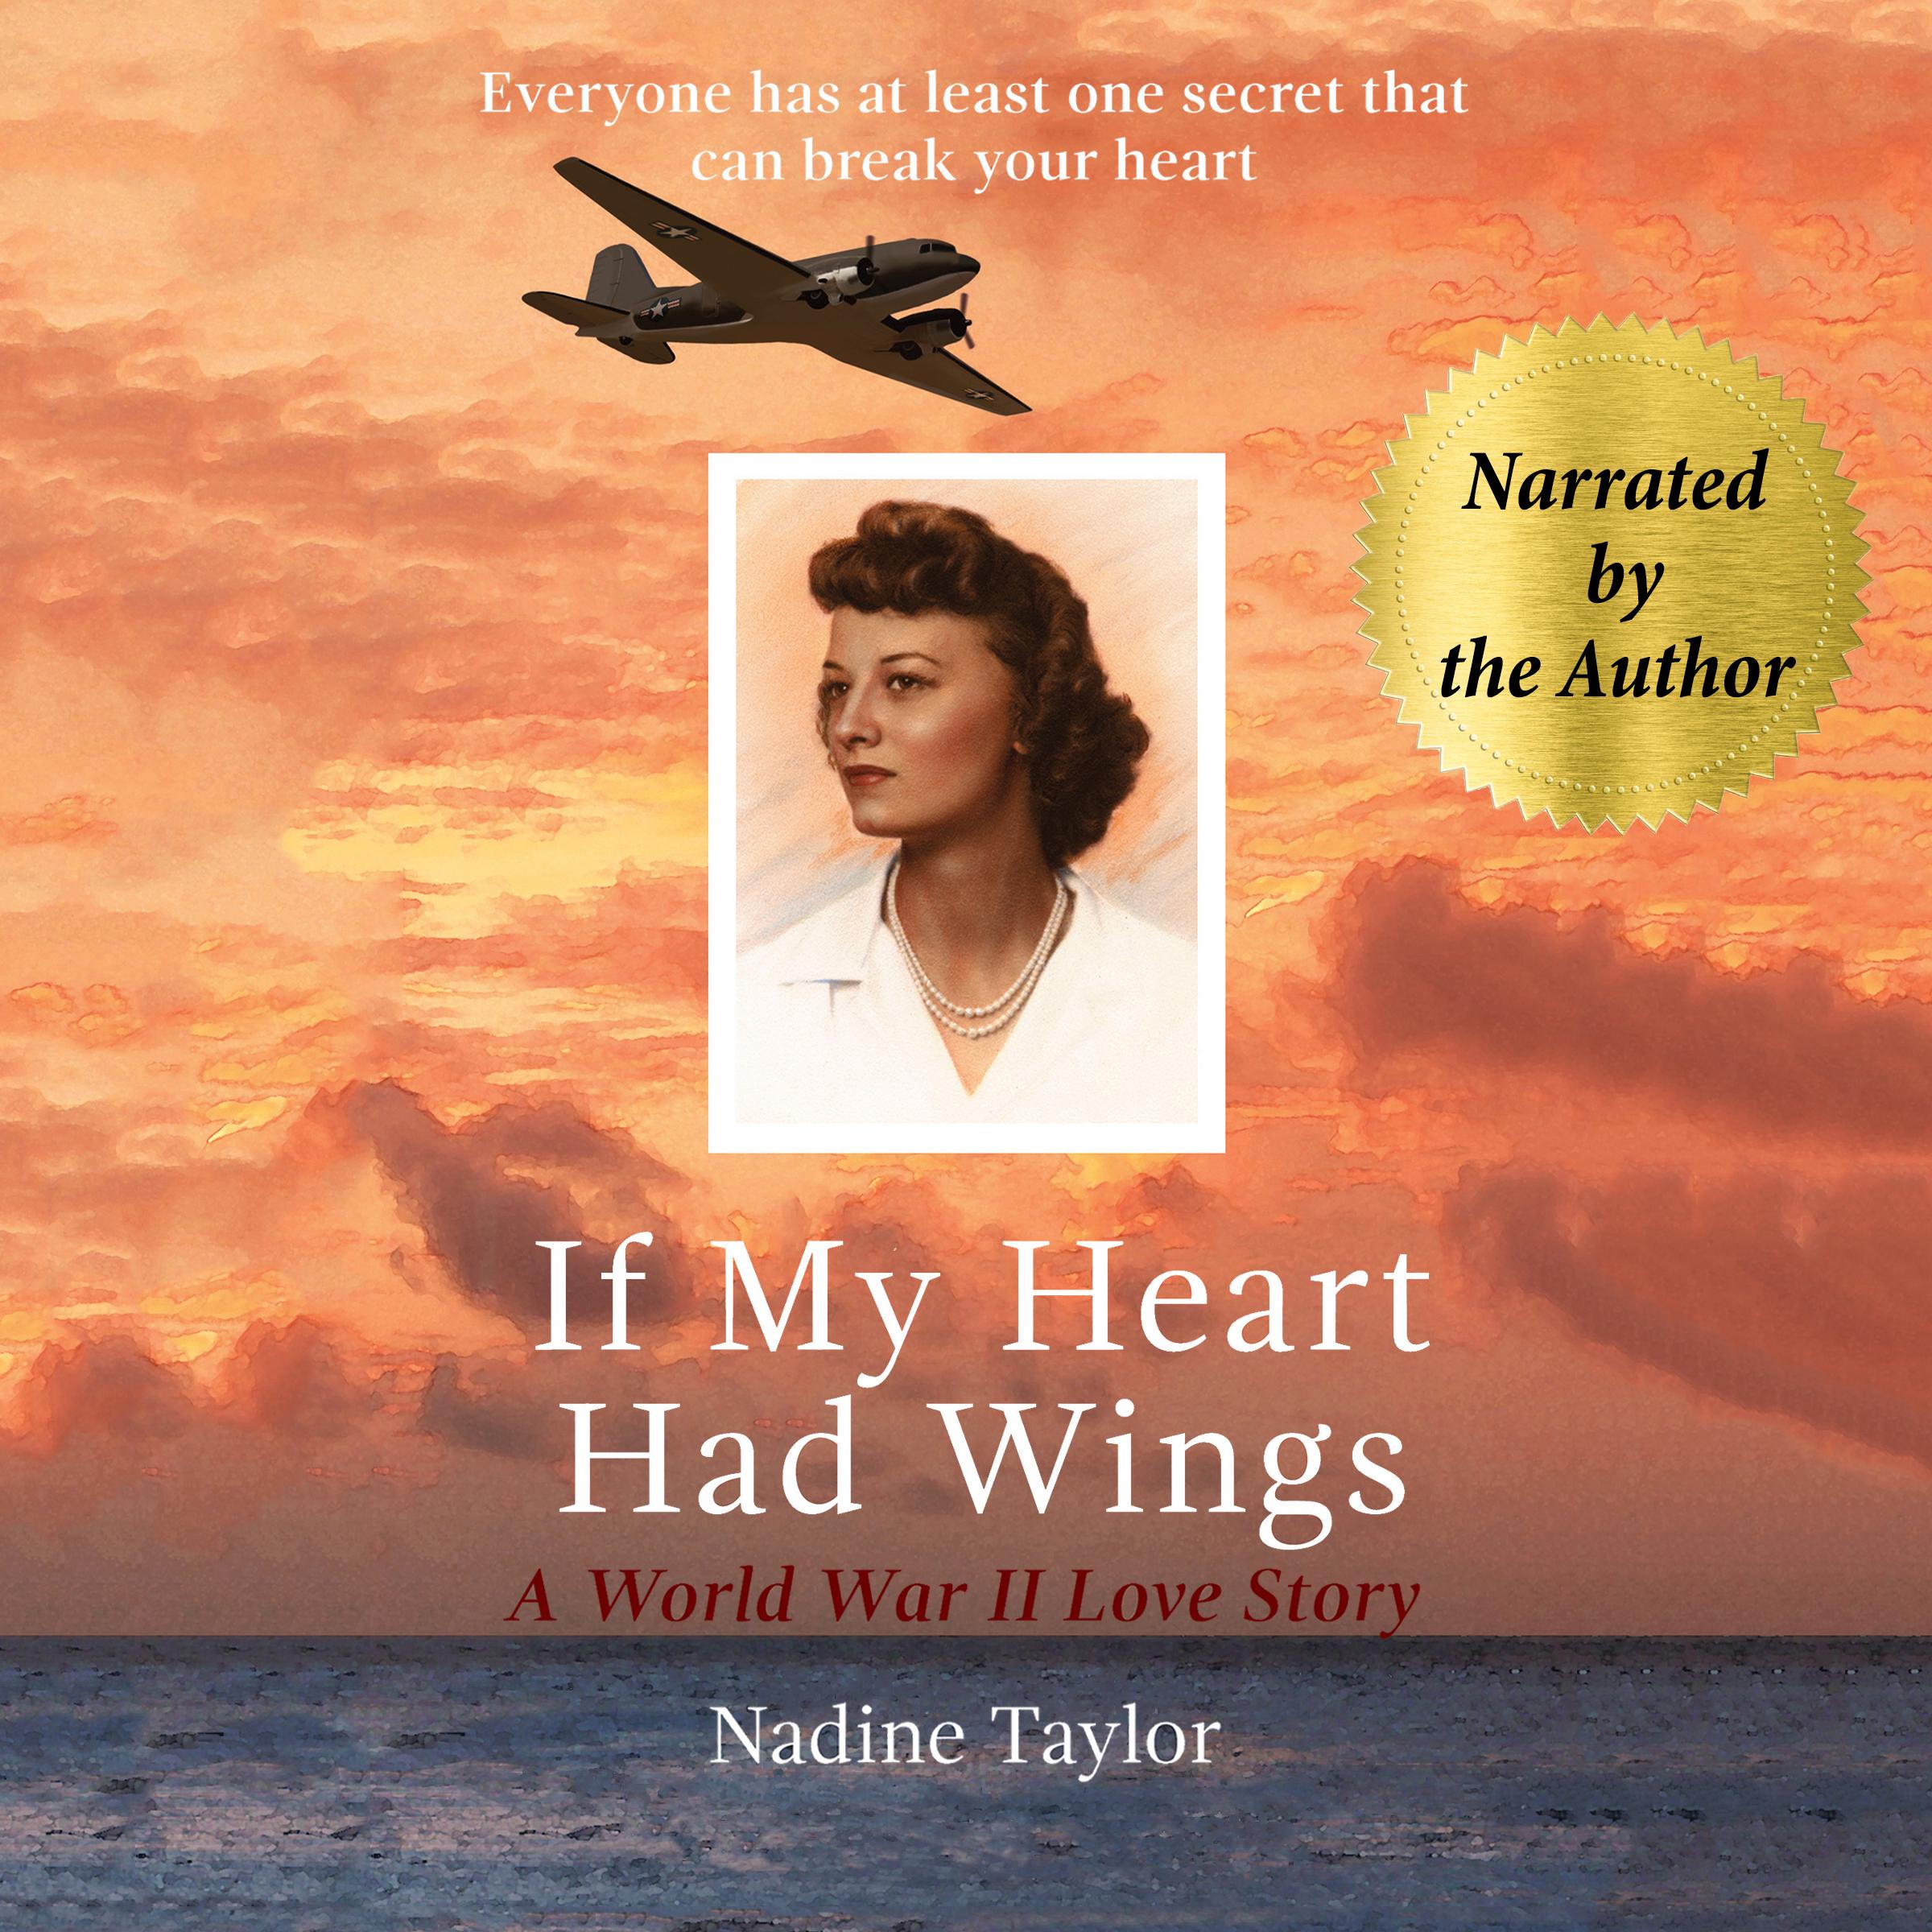 If My Heart Had Wings: A World War II Love Story (Audiobook)